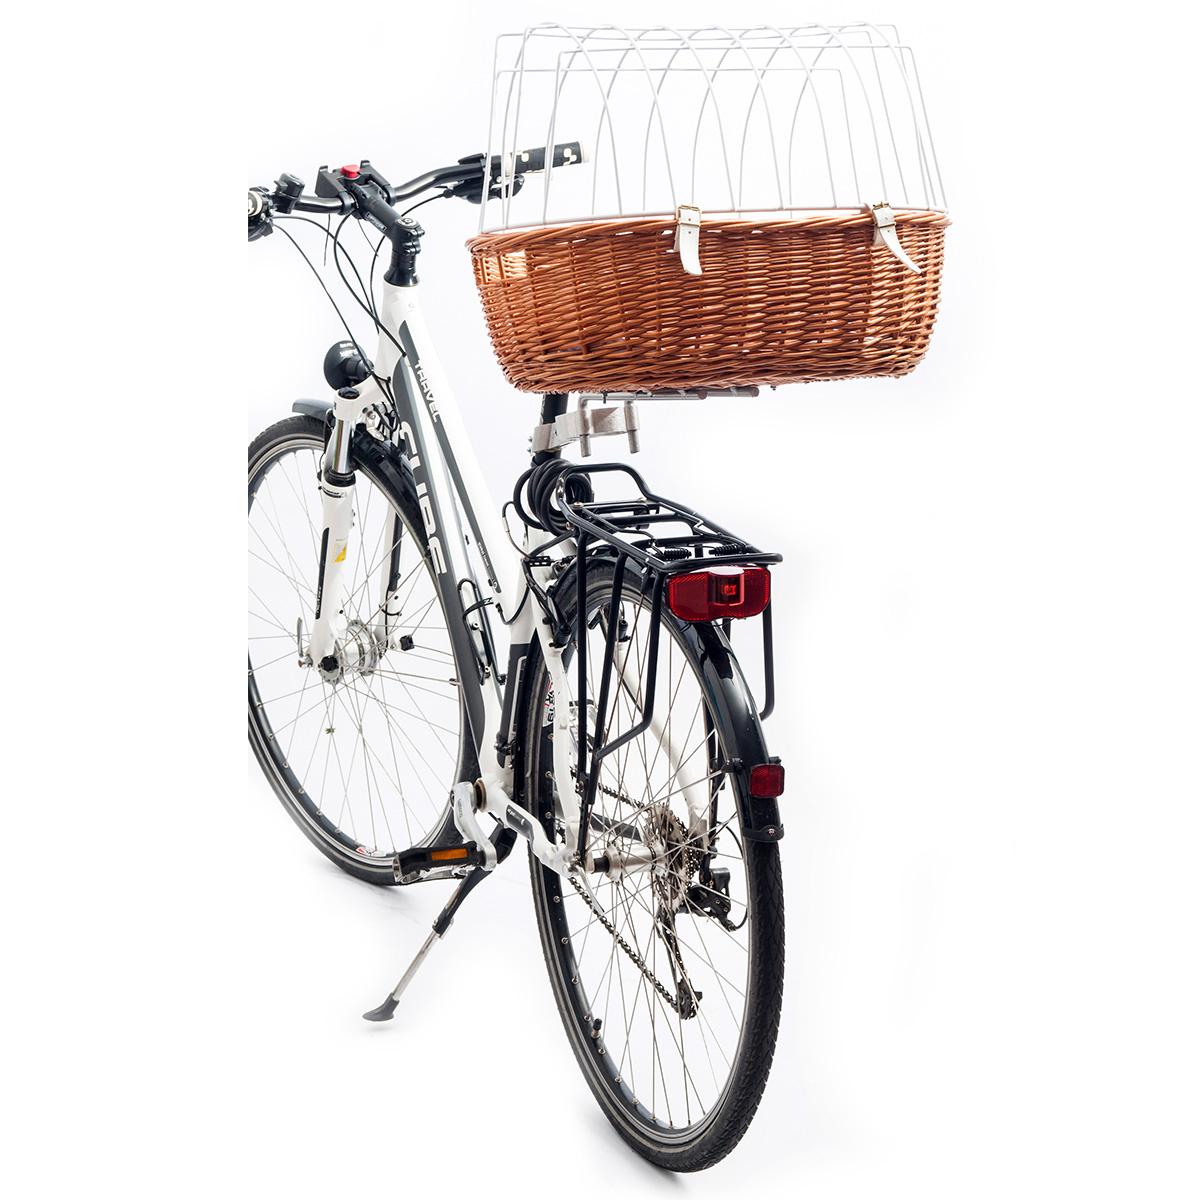 aum ller fahrrad tierkorb weide standard f r rahmenmontage hundekorb fahrradkorb 4011599209237. Black Bedroom Furniture Sets. Home Design Ideas